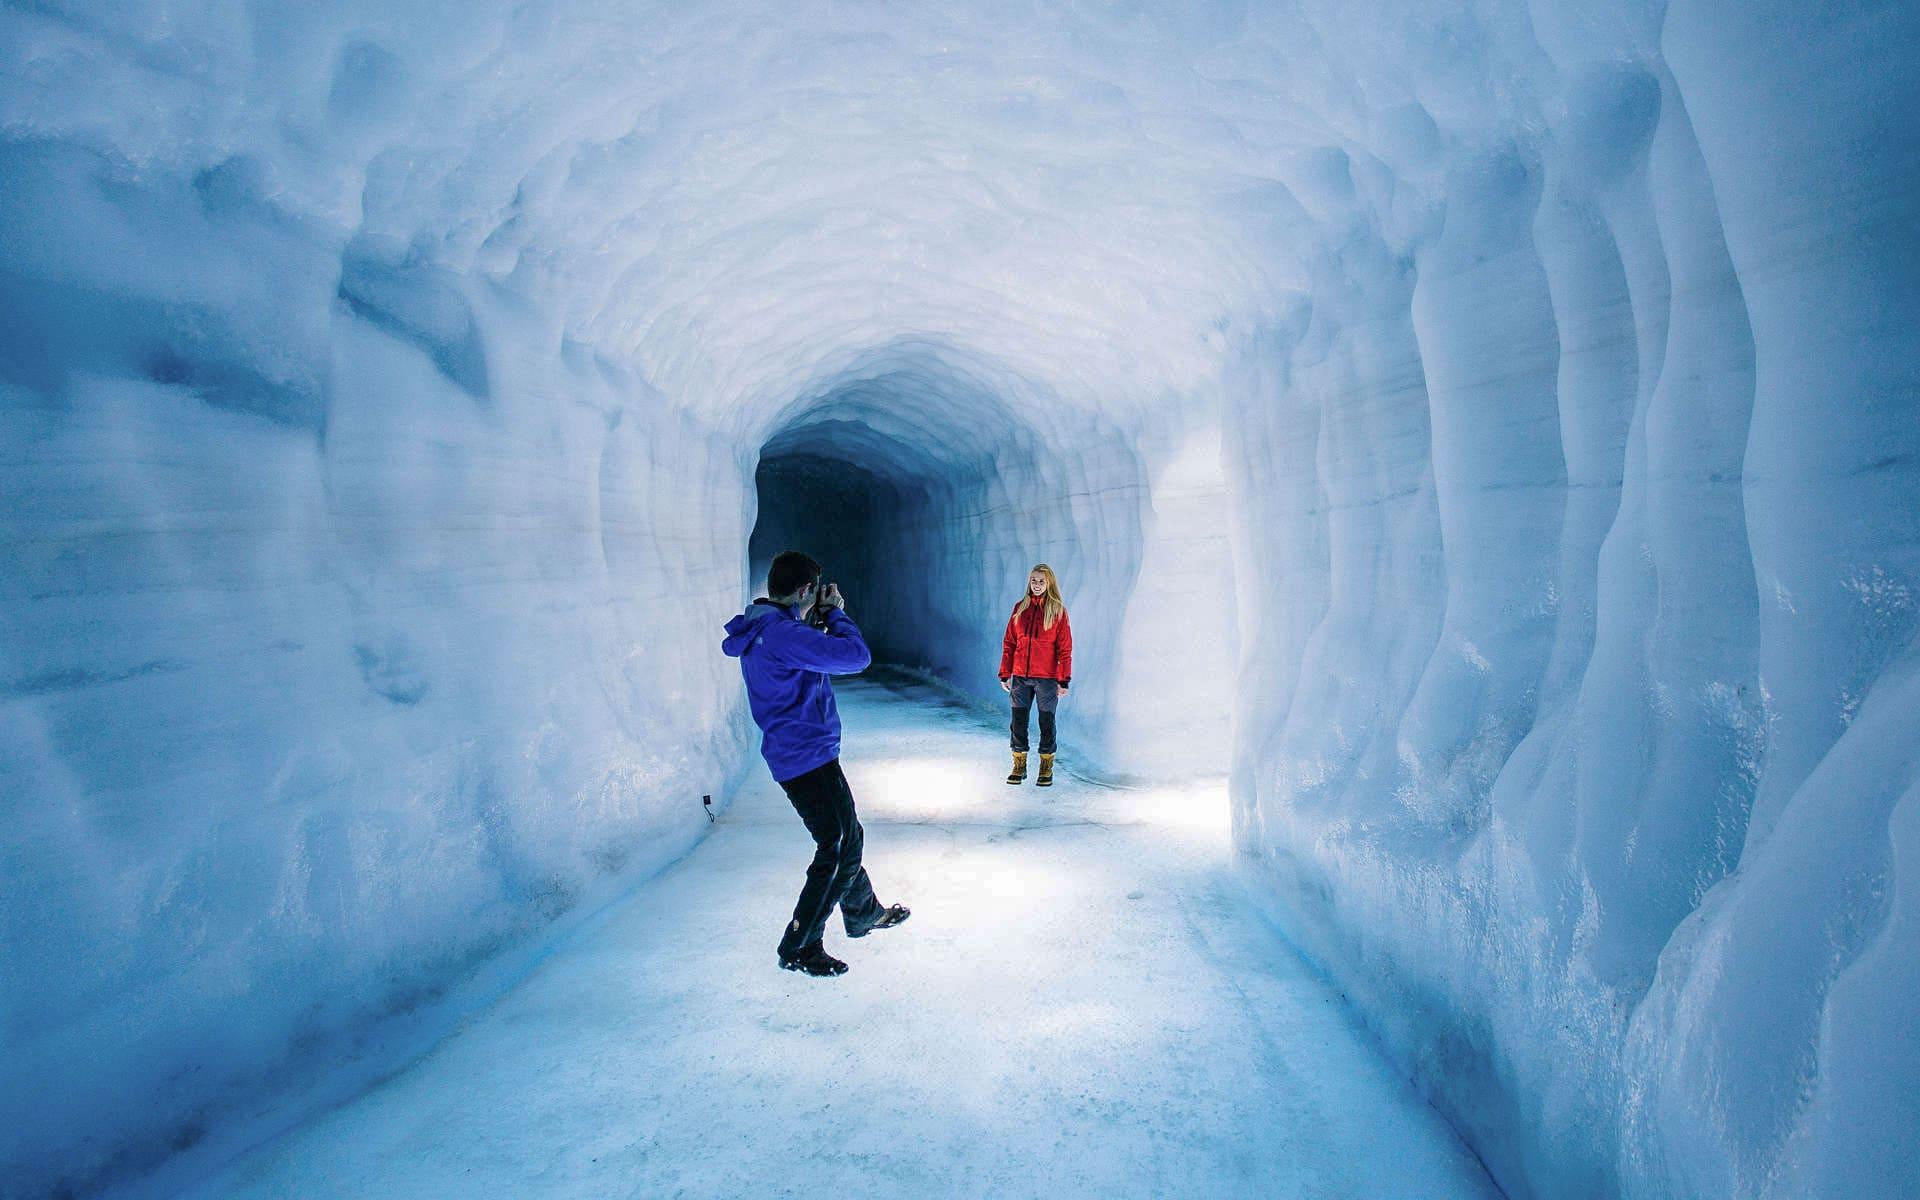 Langjokull Ice Cave tour